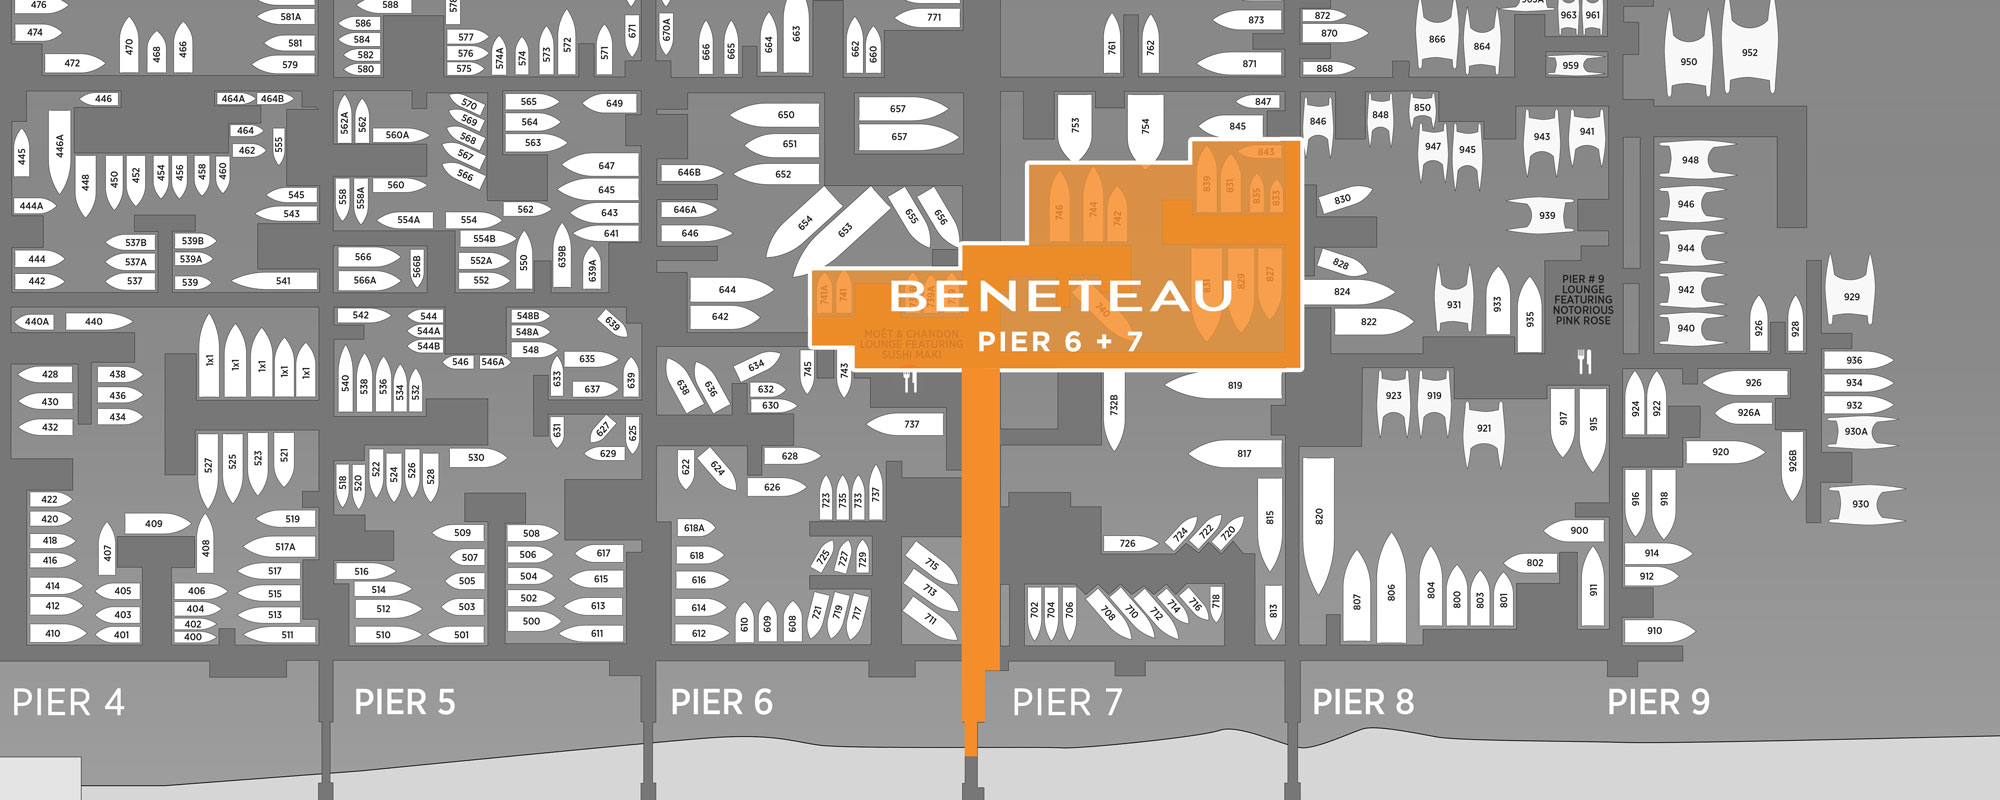 miami-boat-show-beneteau-map